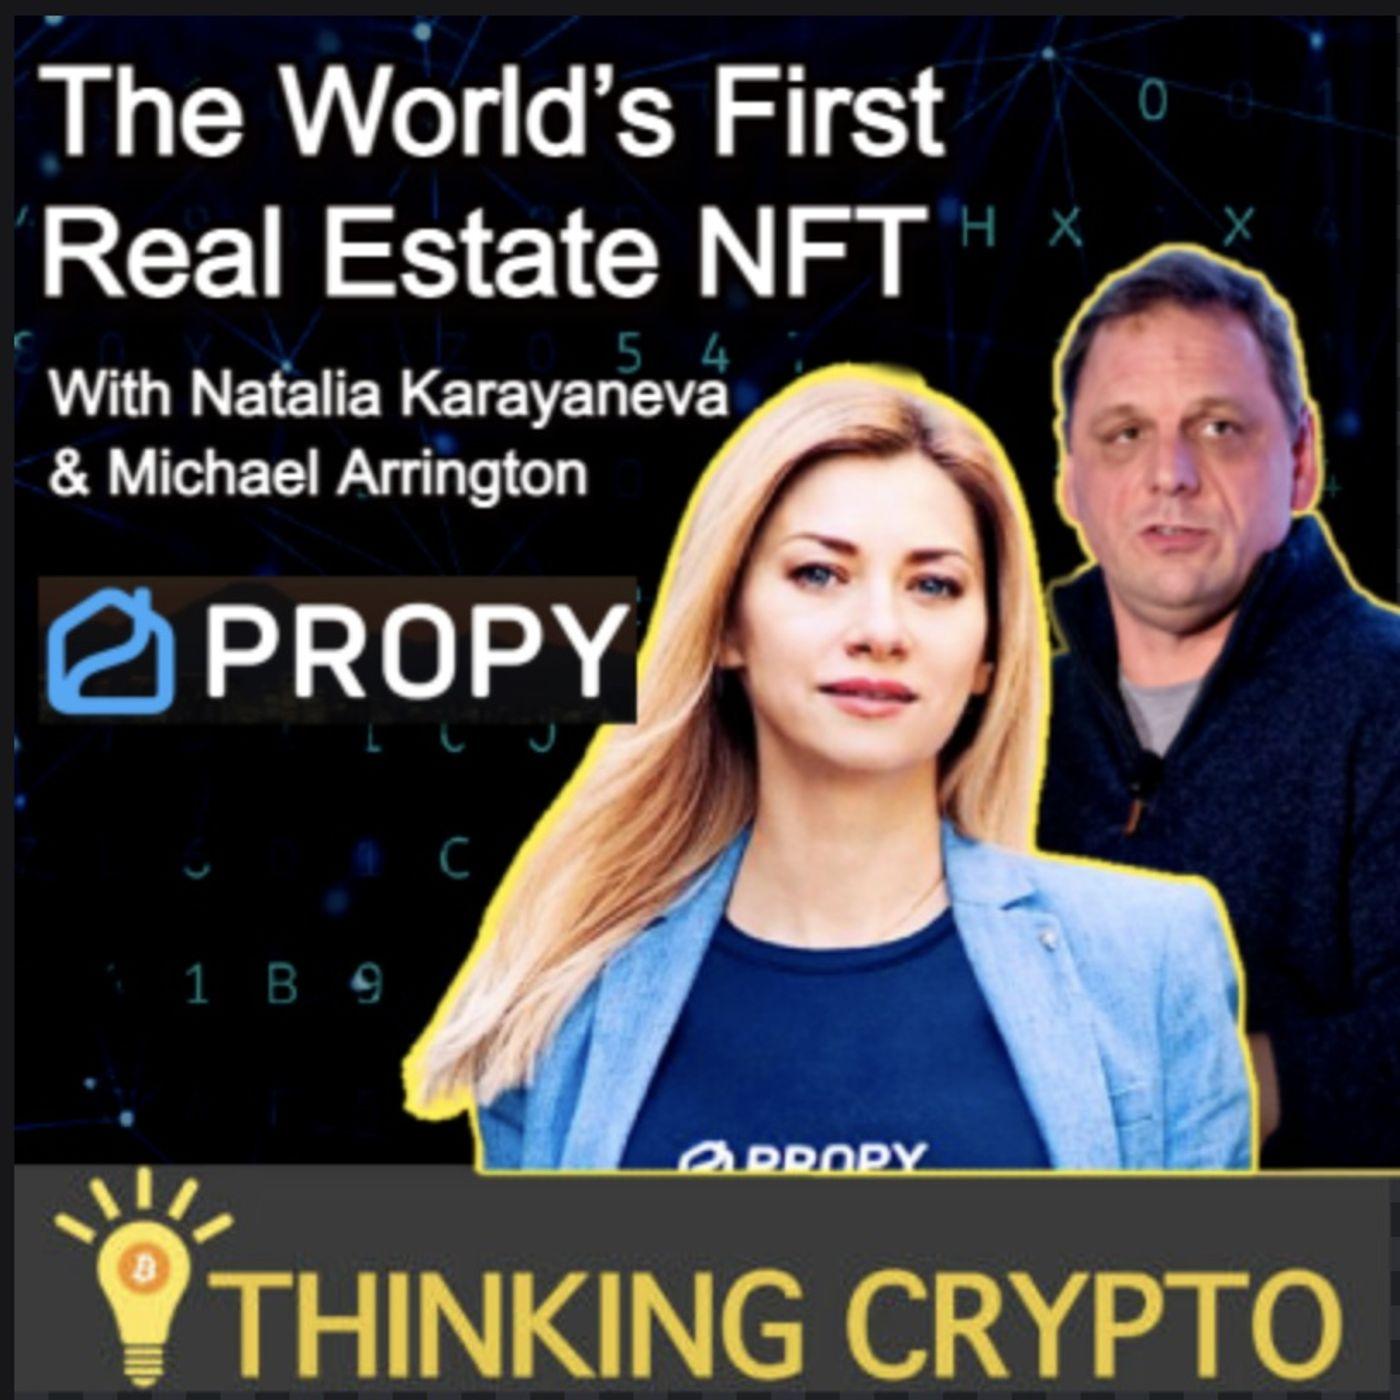 Propy Releases The World's FirstReal Estate NFT - Natalia Karayaneva & Michael Arrington Interview